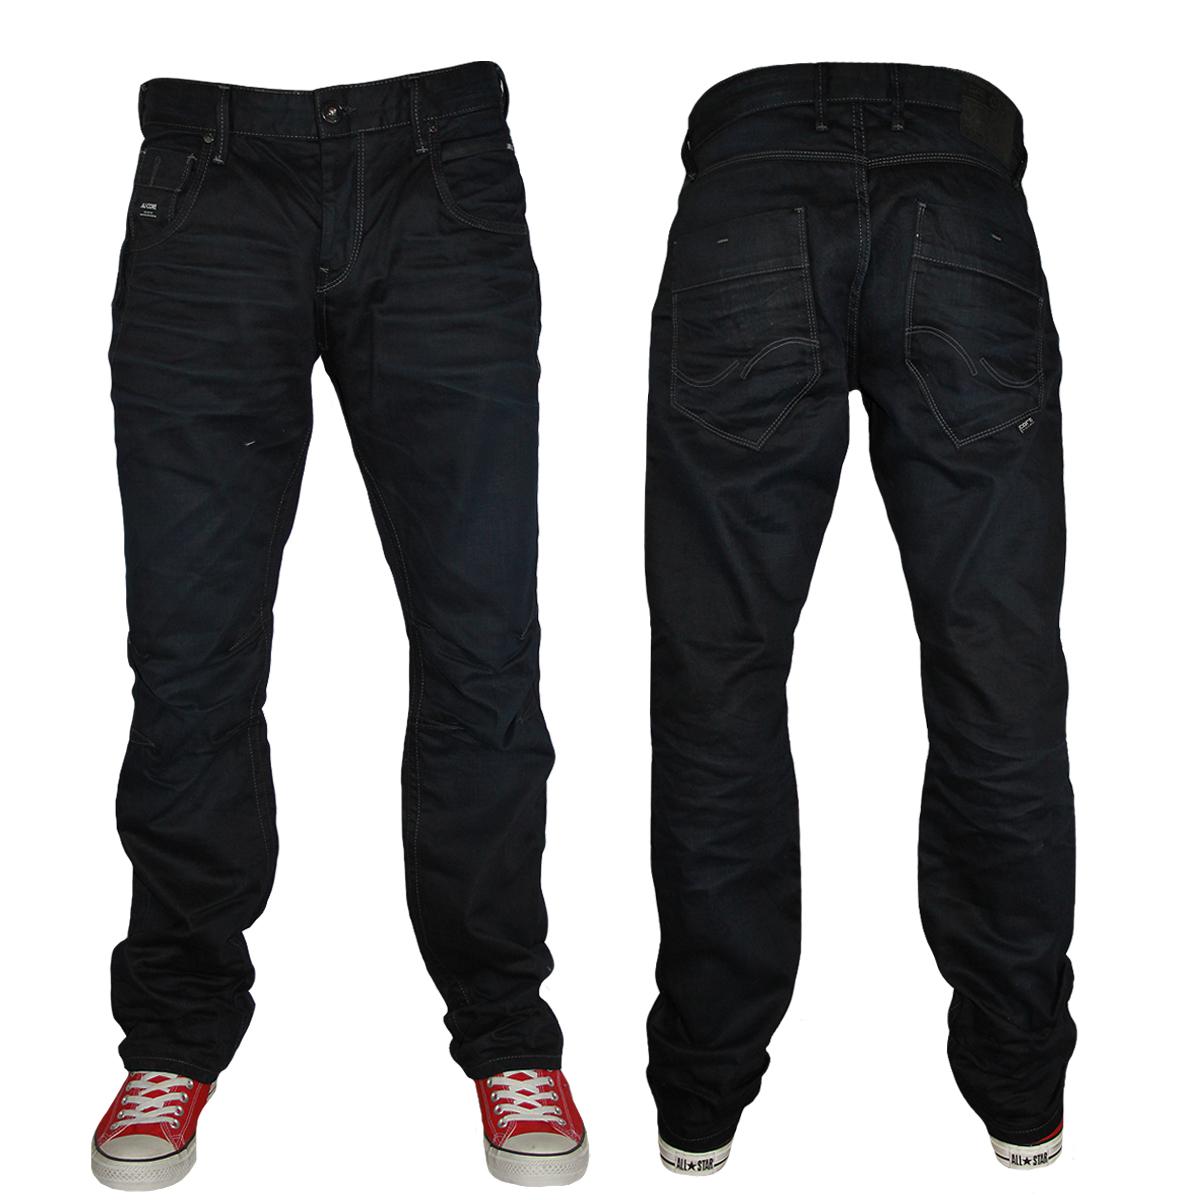 mens blue jack jones boxy powel jj 730 loose fit jeans all waist leg sizes ebay. Black Bedroom Furniture Sets. Home Design Ideas